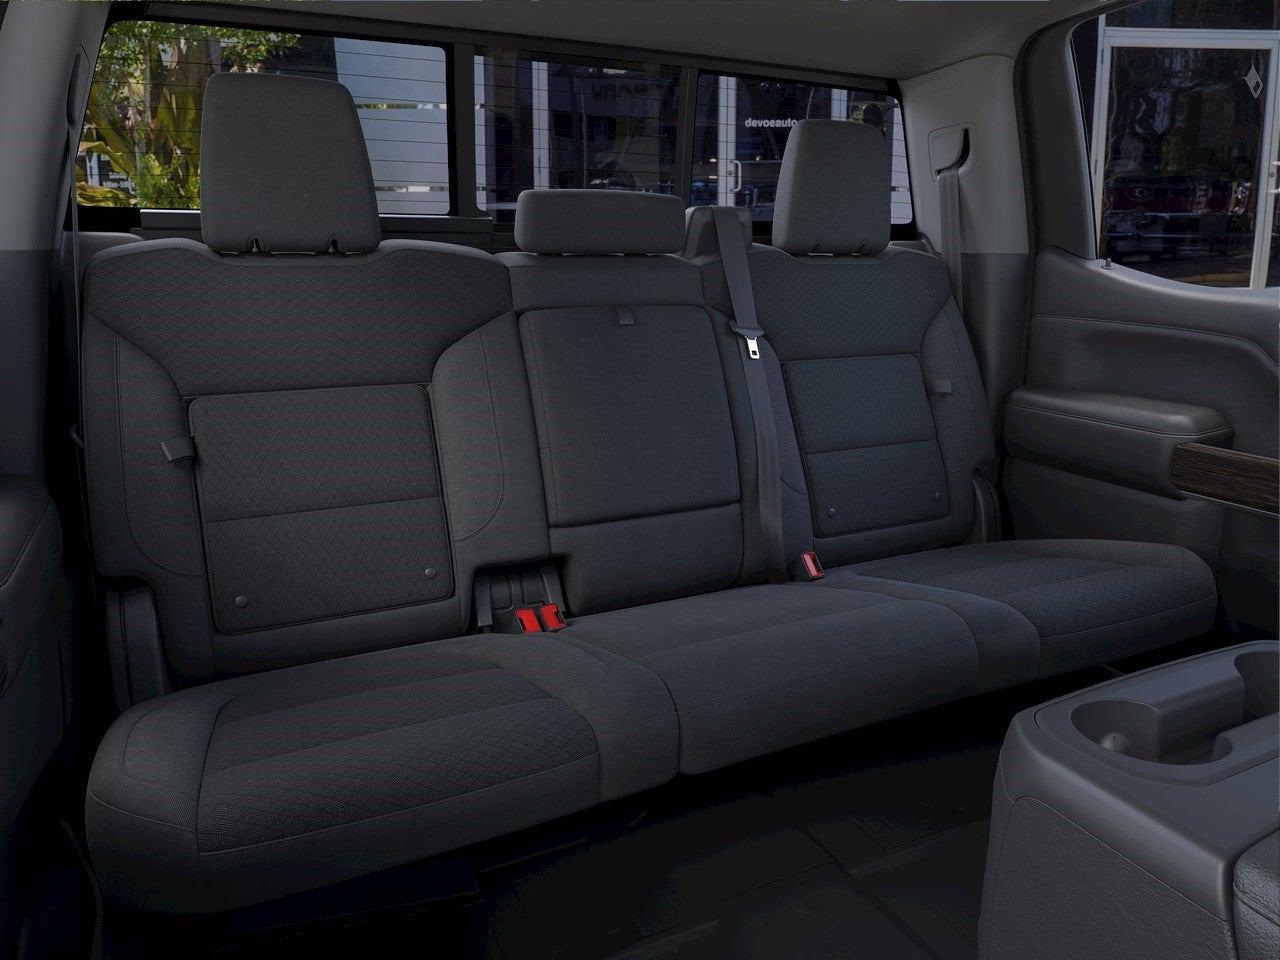 2021 GMC Sierra 1500 Crew Cab 4x2, Pickup #T21323 - photo 34